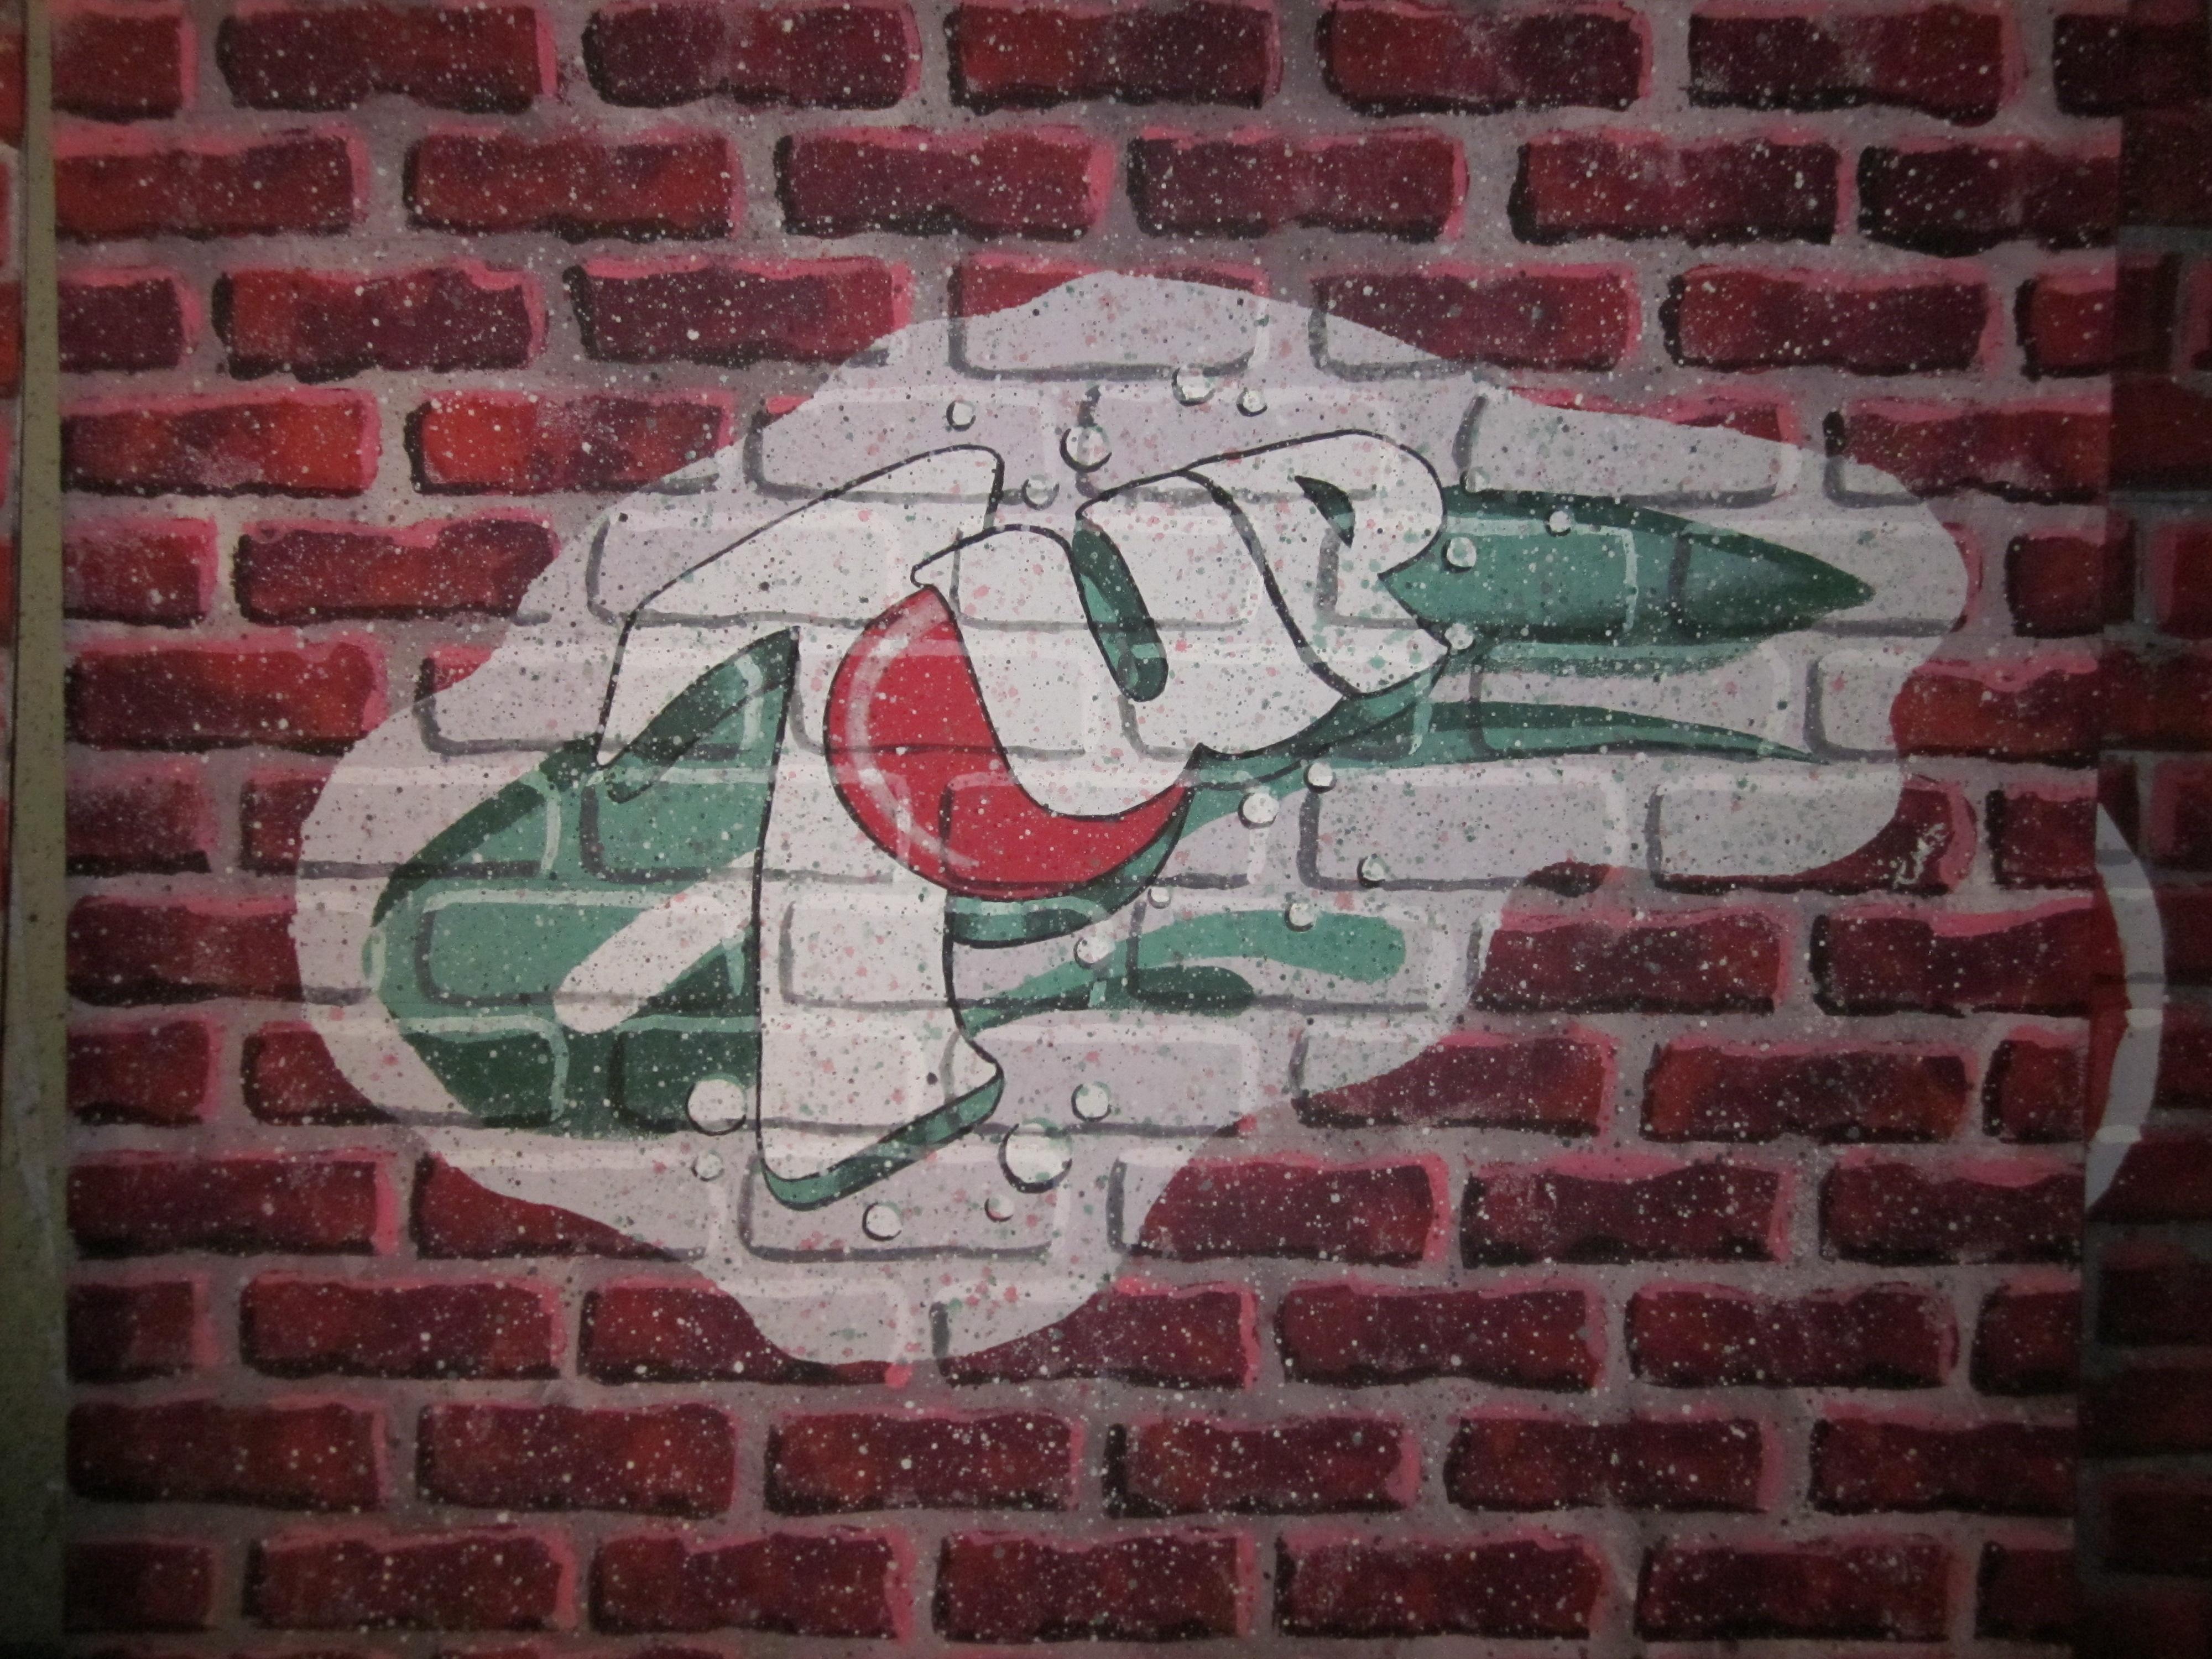 Scenic Painting - Brickwork & Logo